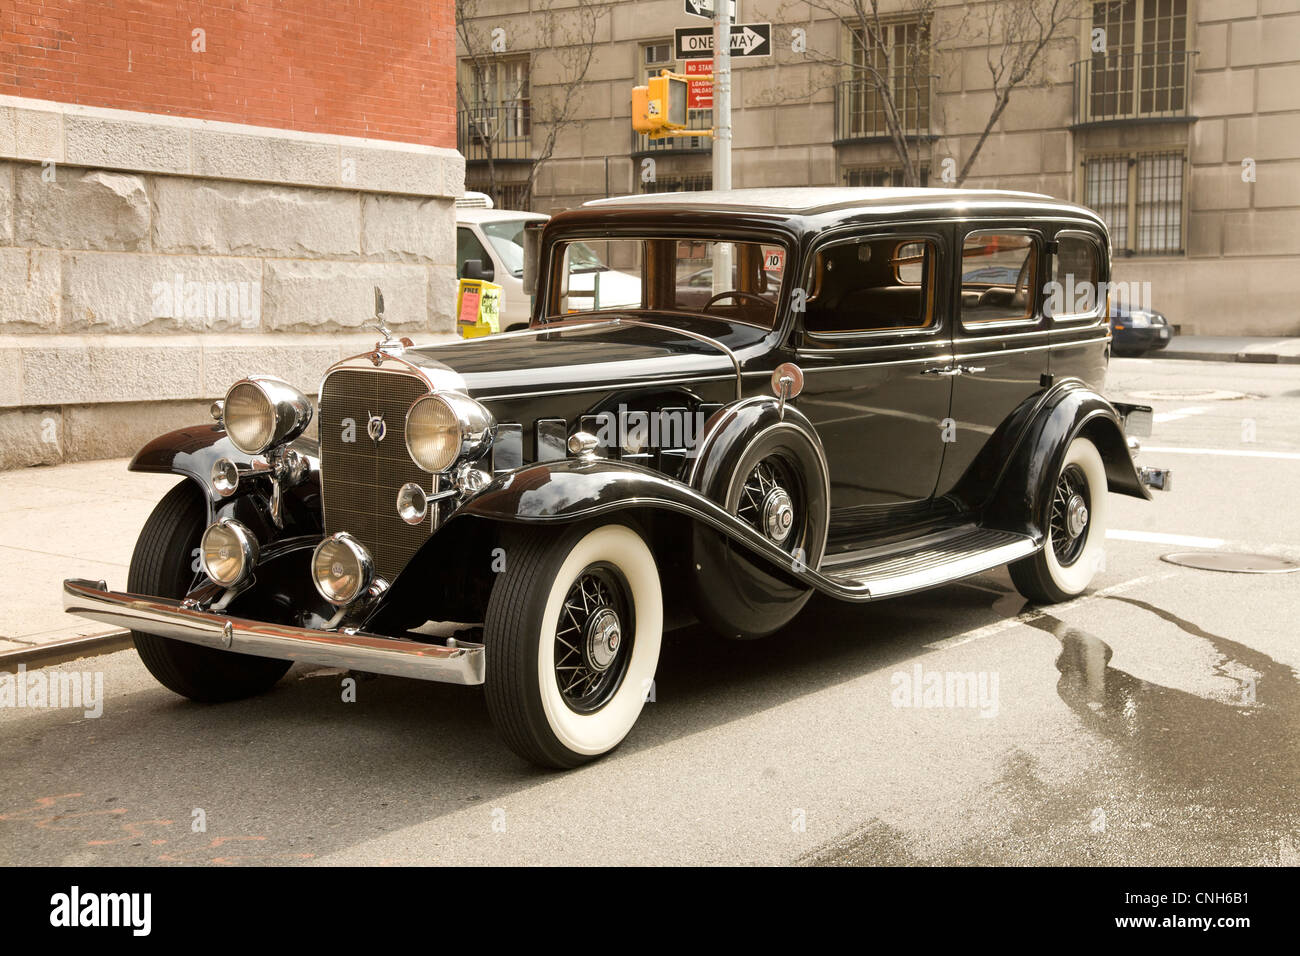 1932 Cadillac V12 Limousine. - Stock Image